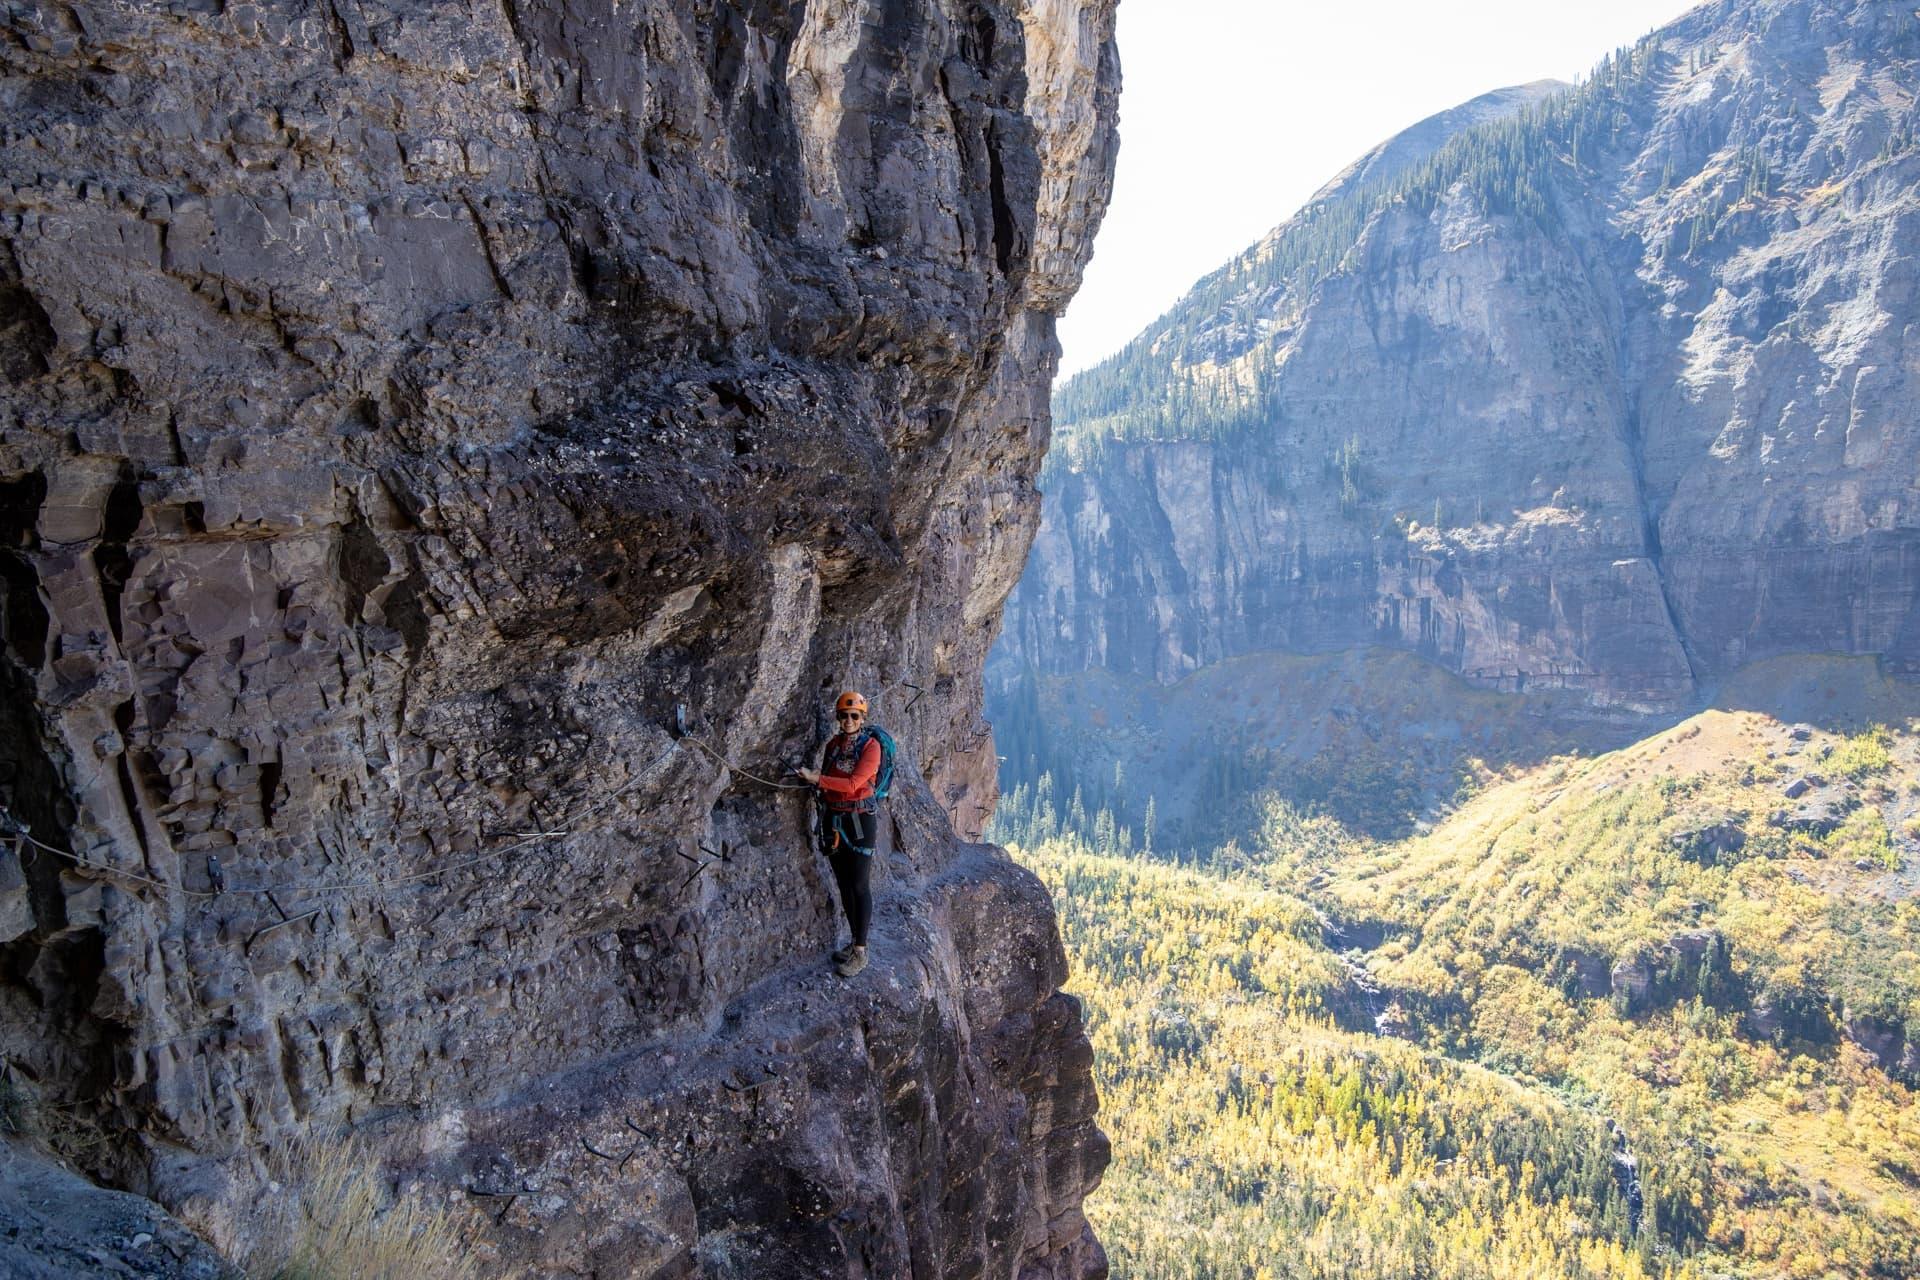 Telluride Via Ferrata: Everything you Need to Know